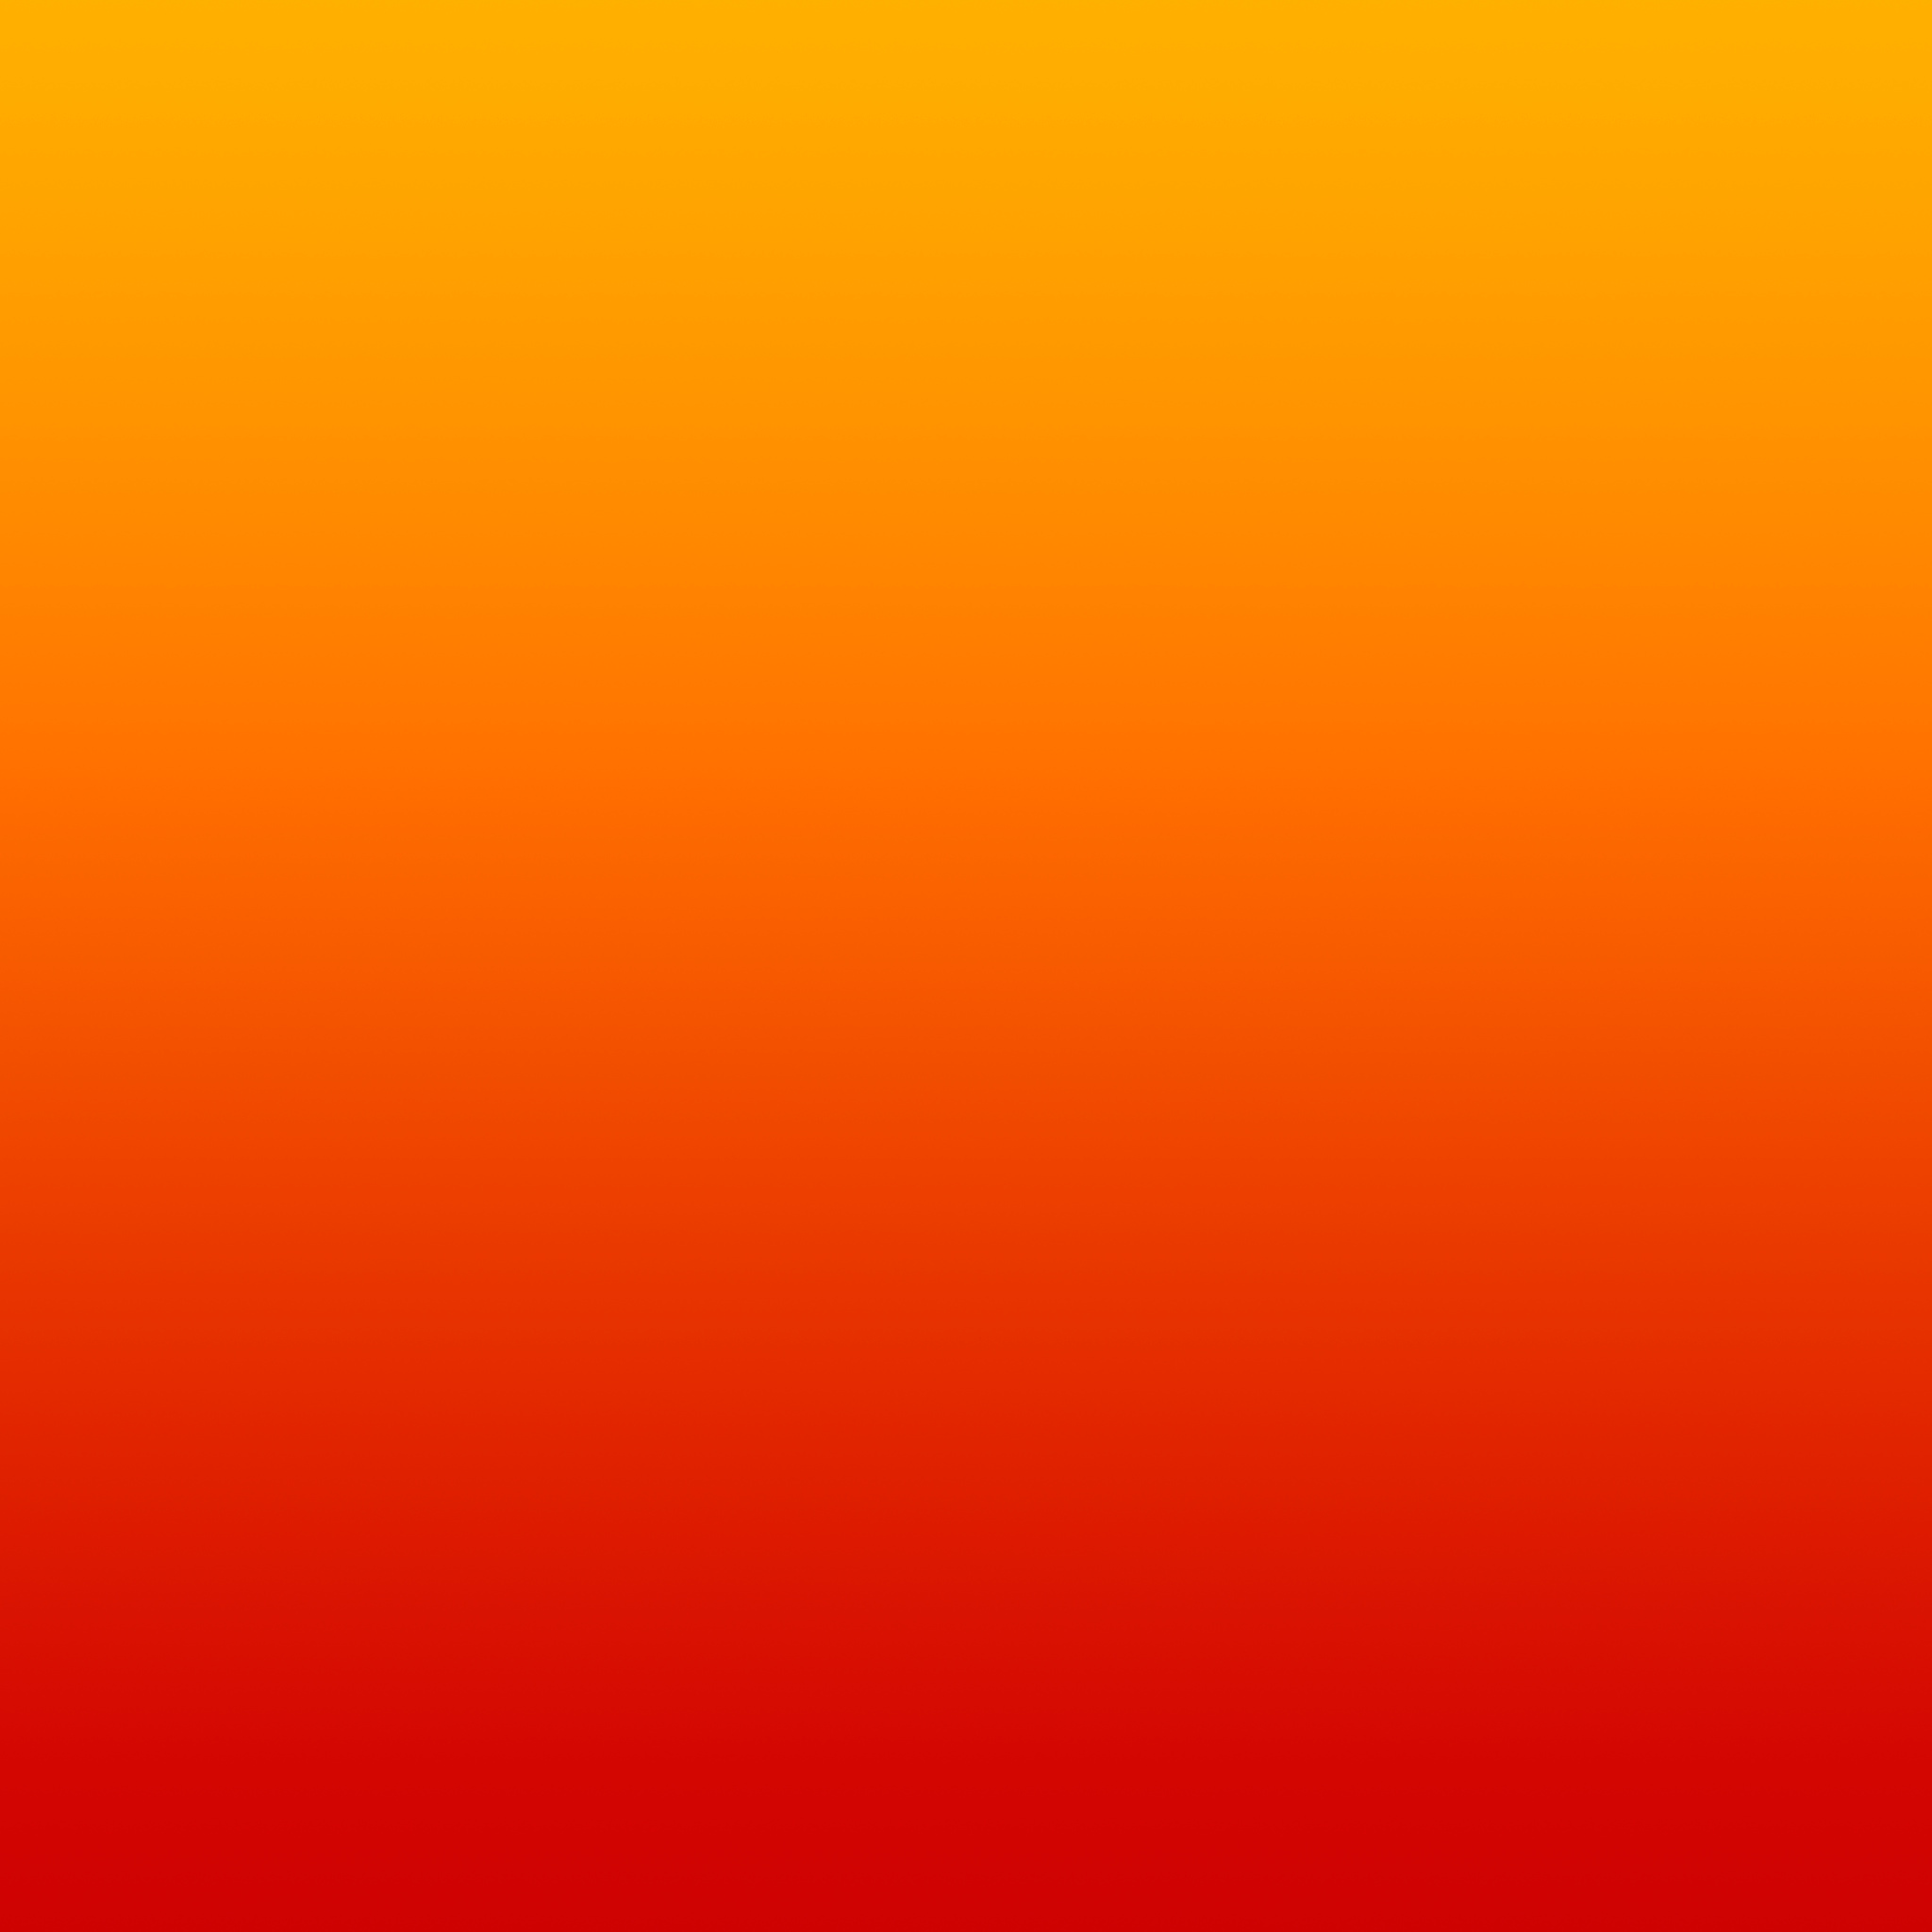 Orange Gradient iPad Air Wallpapers HD iPad Air Retina Wallpapers and 2048x2048